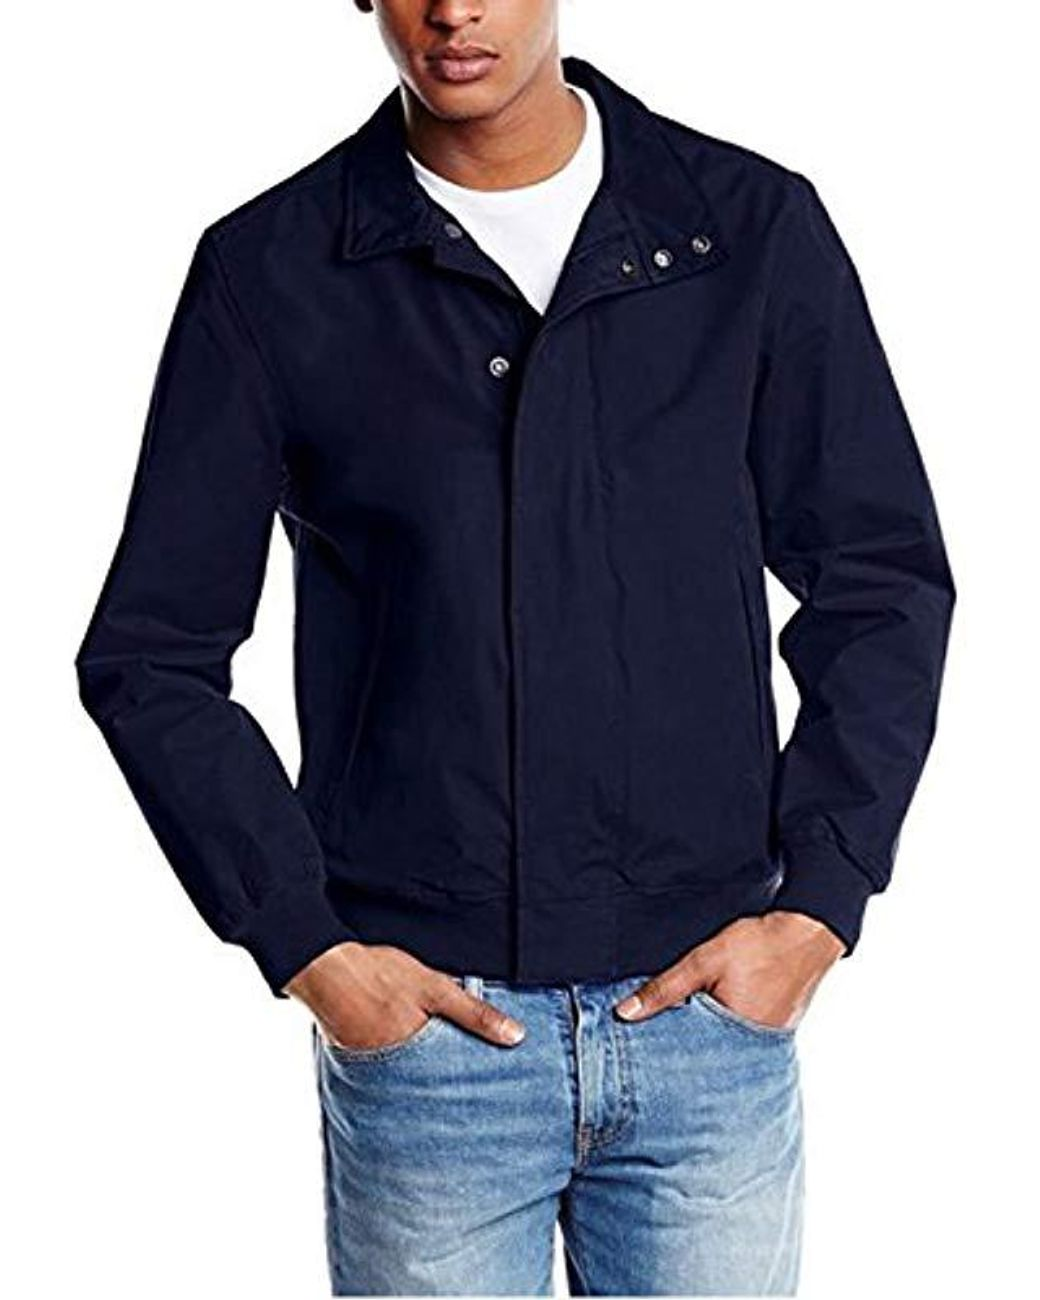 Timberland Cotton Clothing Hv Mount Pierce Bomb Raincoat in